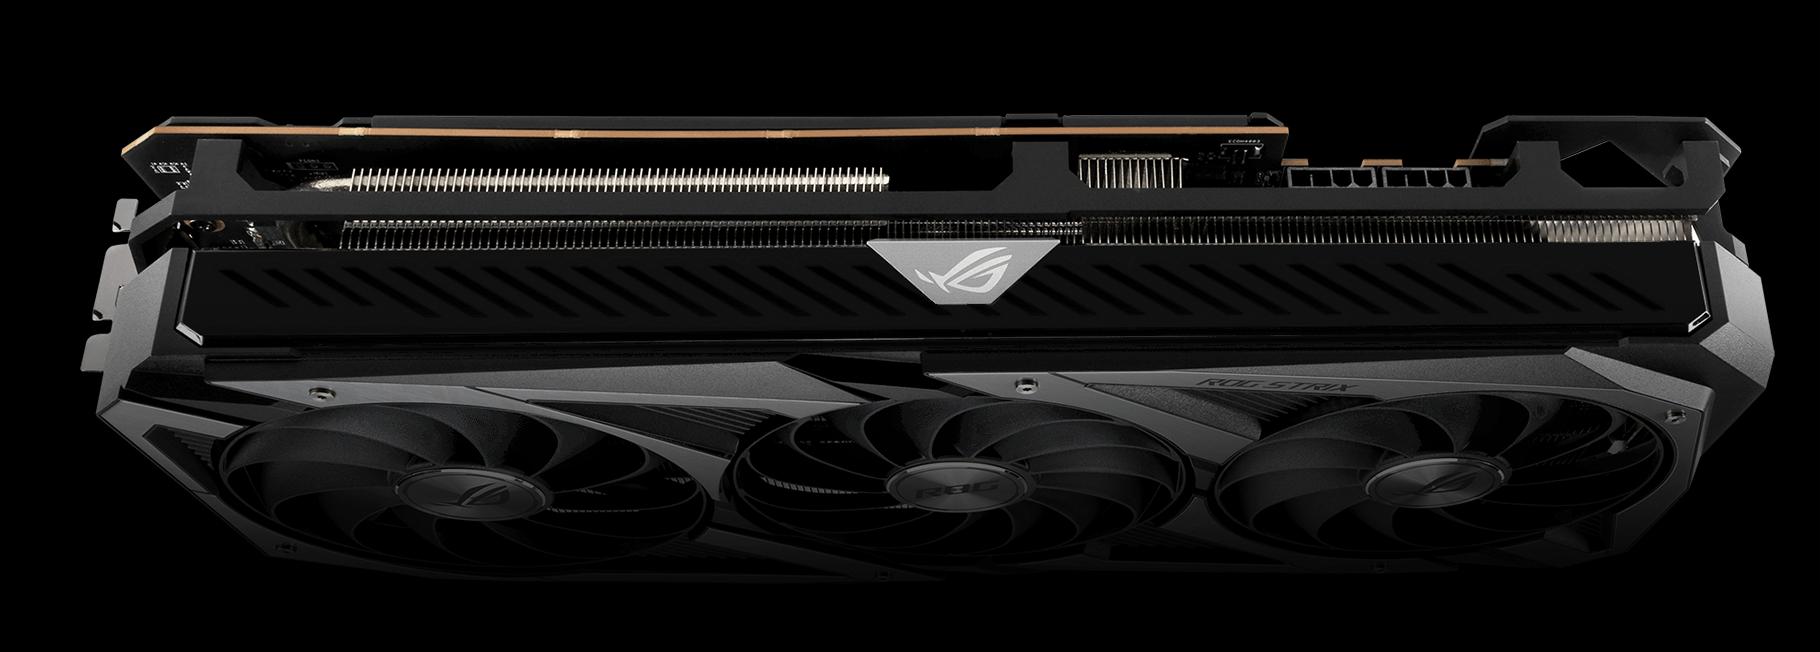 Radeon™ RX 6800